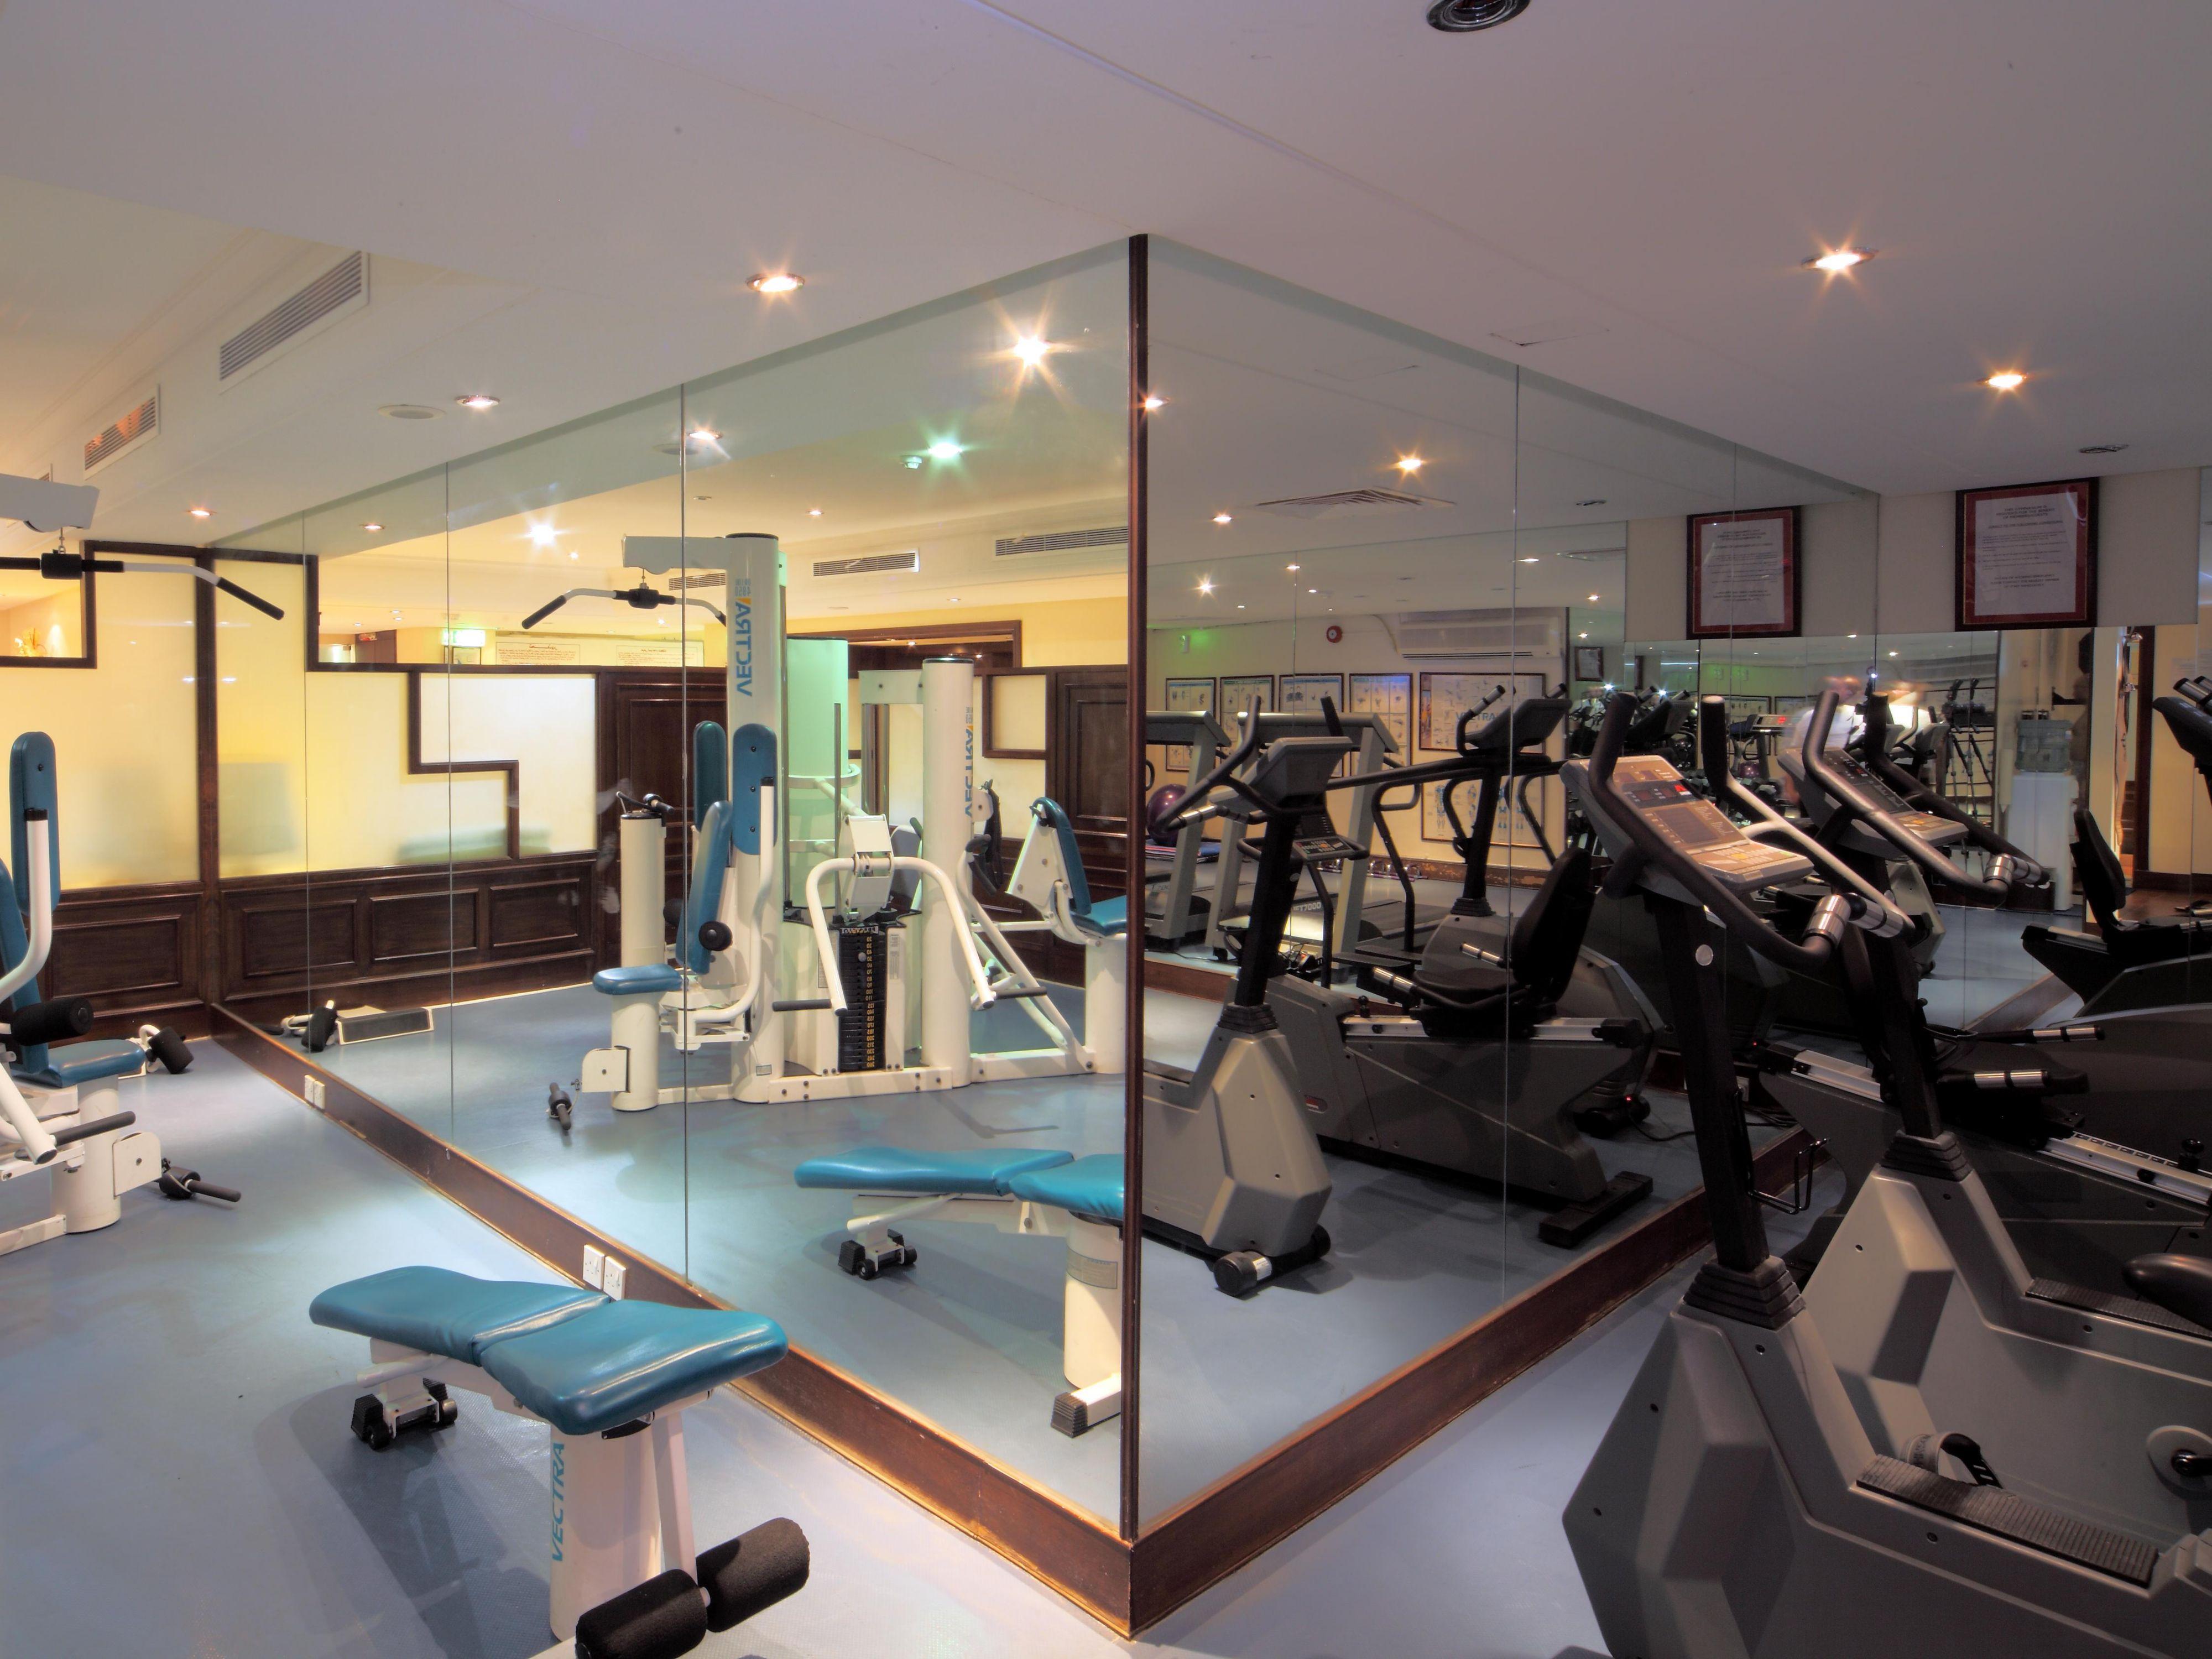 Crowne plaza jeddah health and fitness facilities